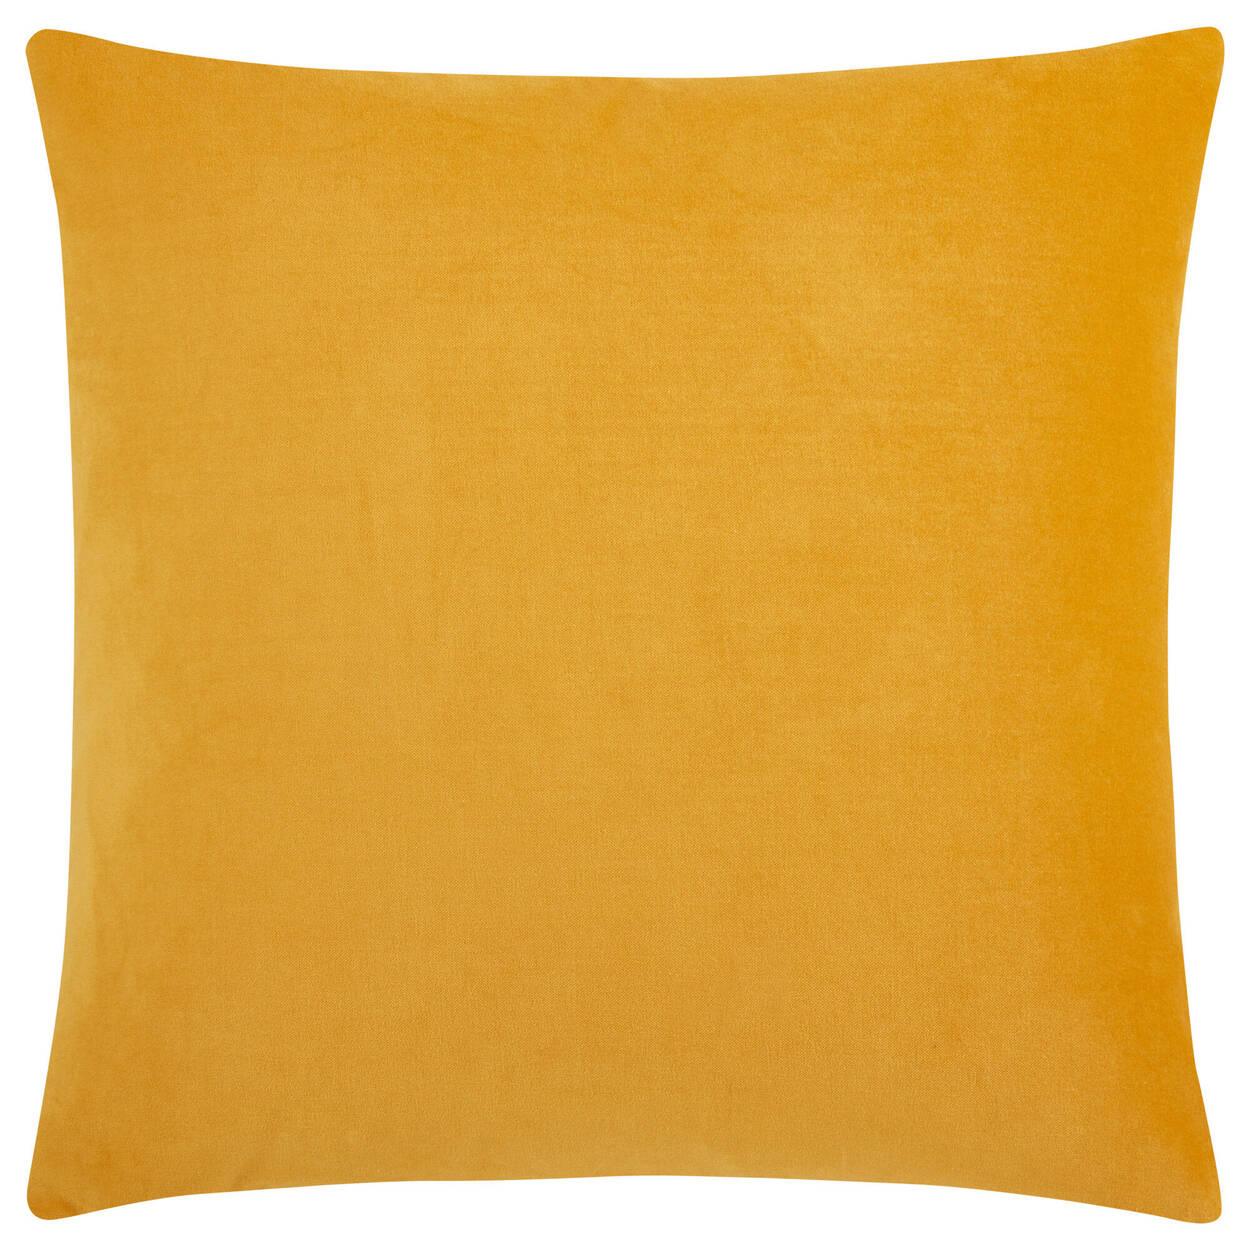 "Billie Decorative Pillow 20"" x 20"""